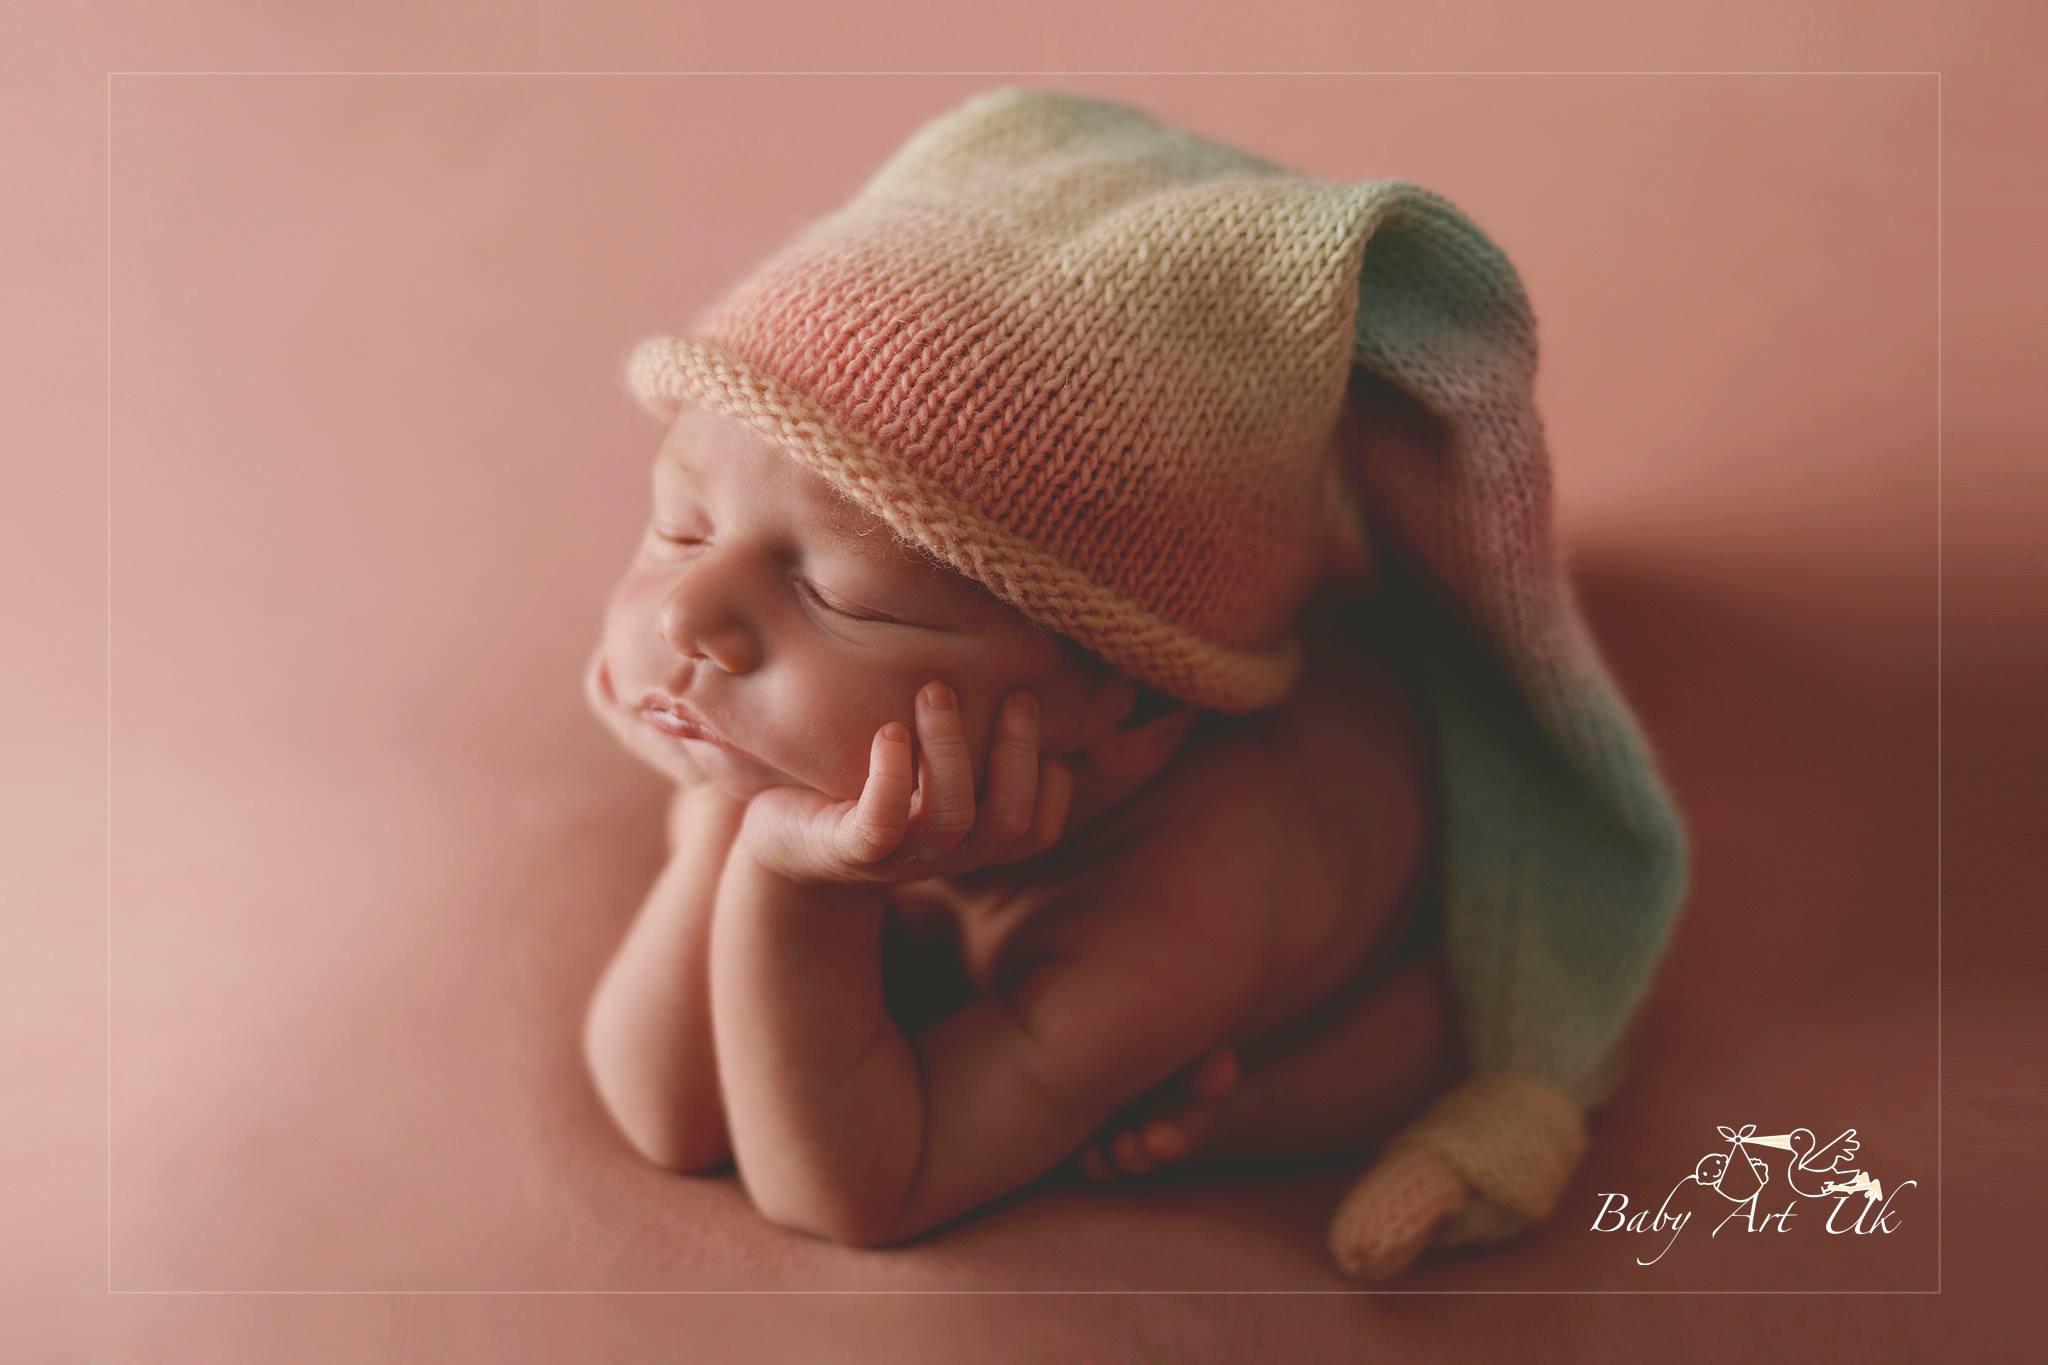 babyart1